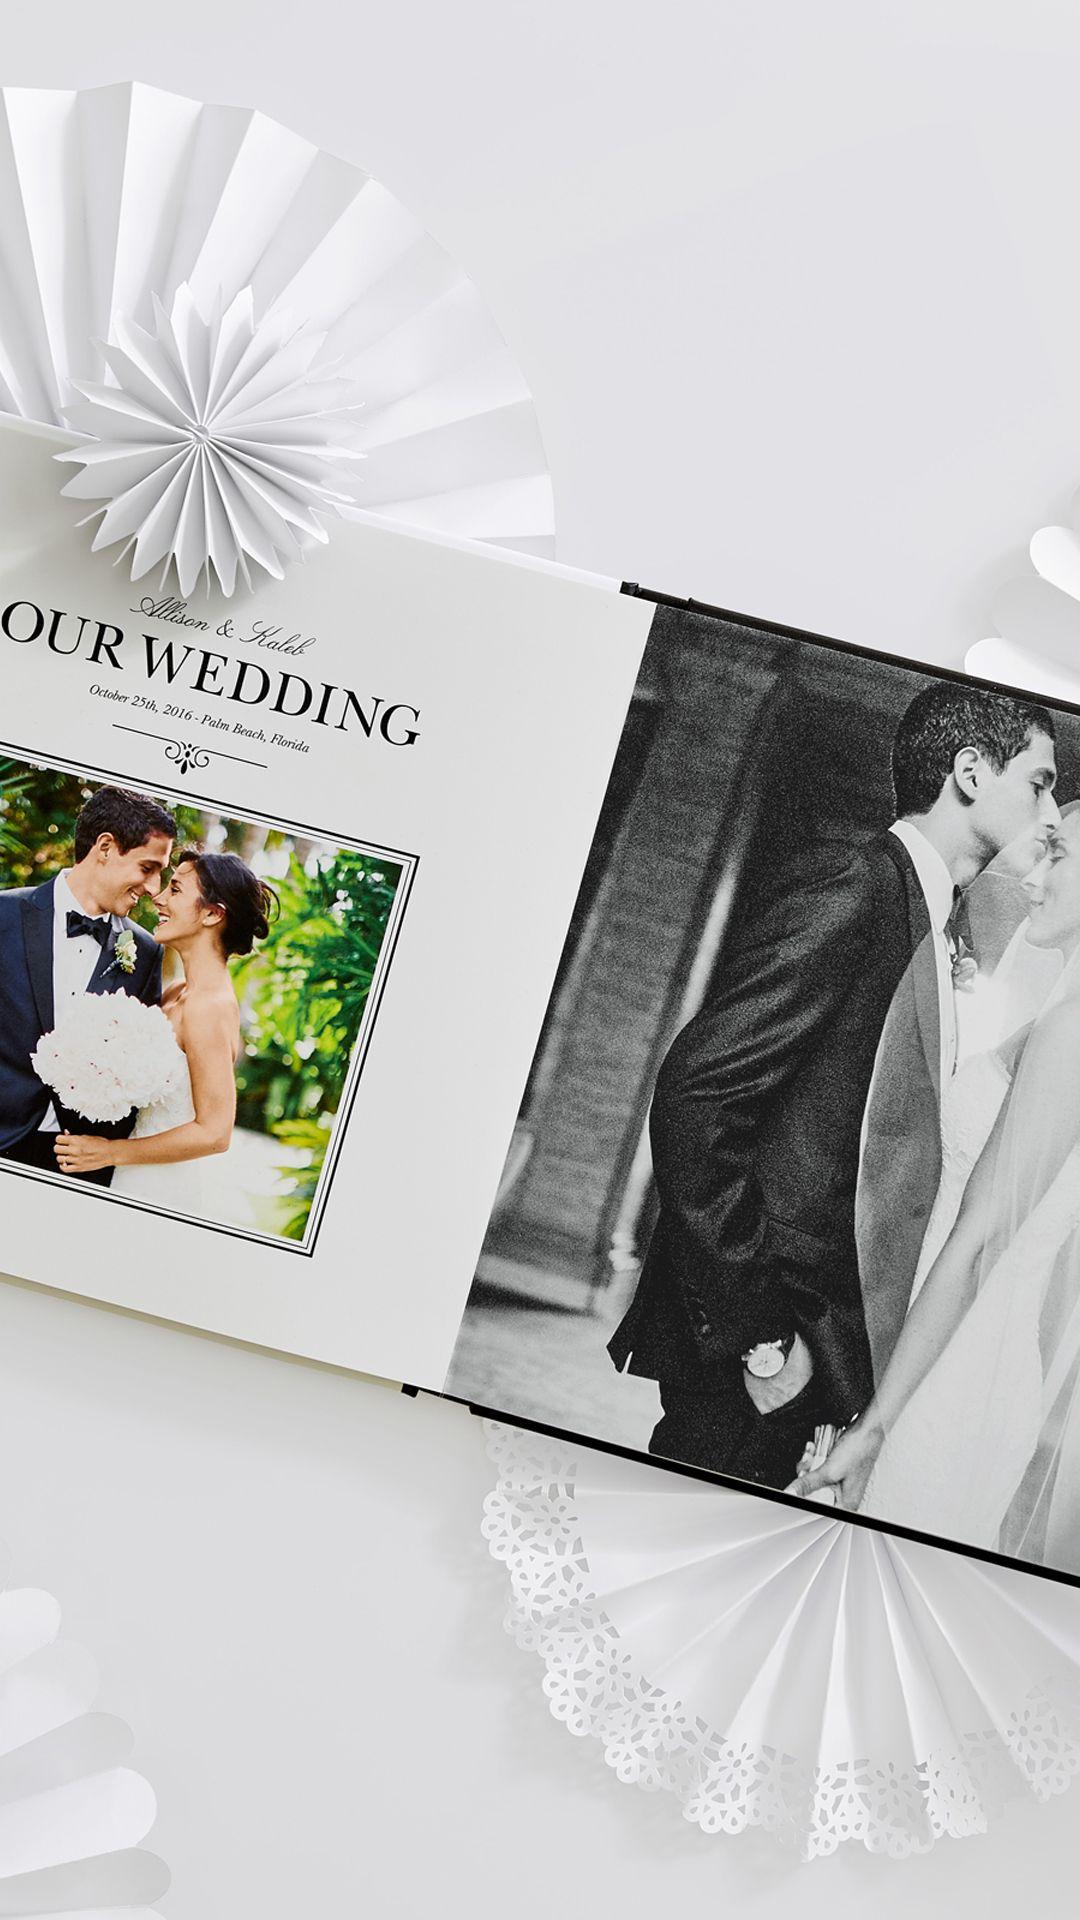 Wedding Albums . Introducing the Wedding Shop by